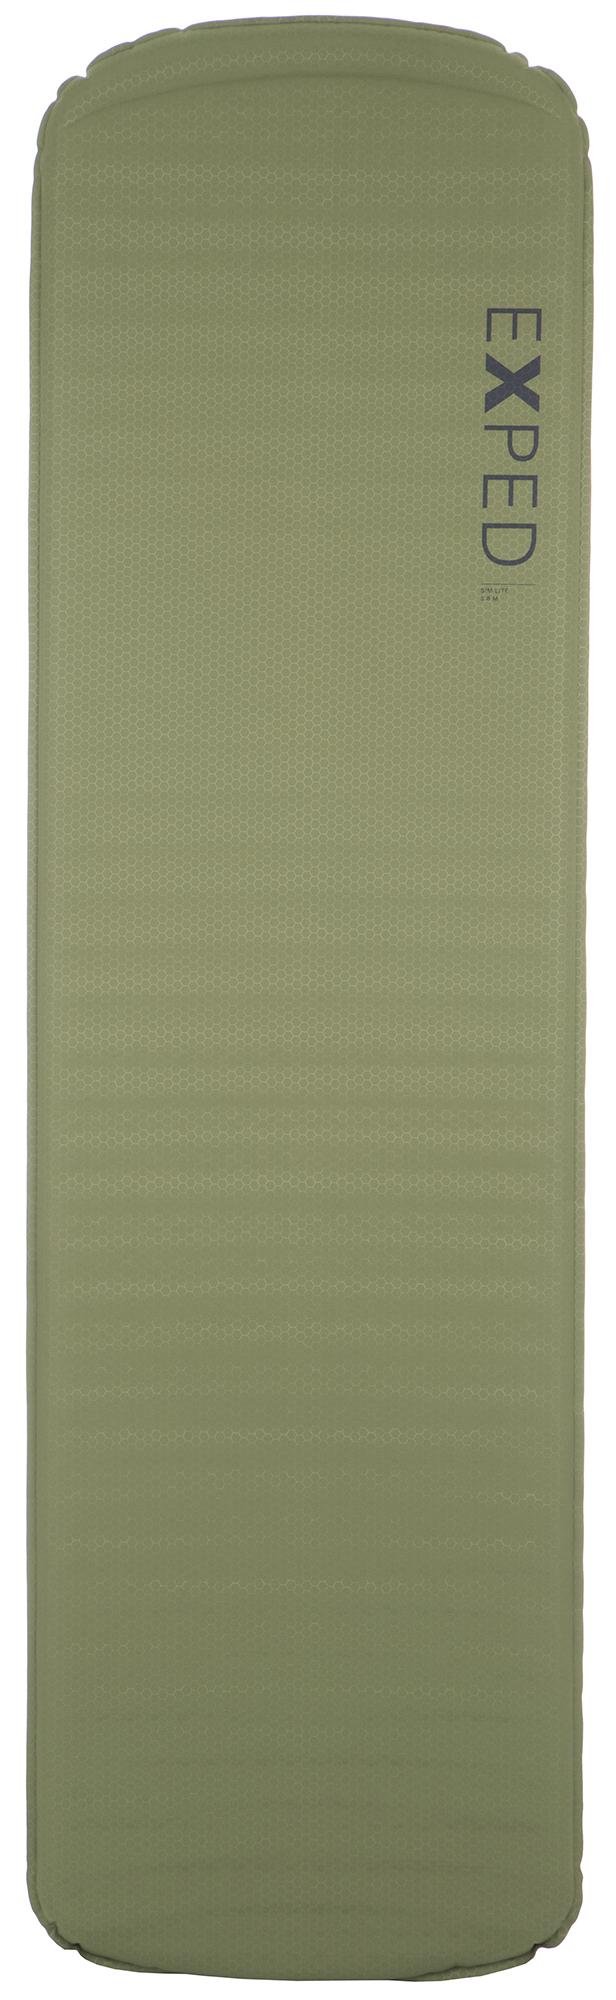 коврик norfin коврик самонадувающийся atlantic comfort nf 5 0см Exped Коврик самонадувающийся Exped SIM Lite 3.8 M, 183 см